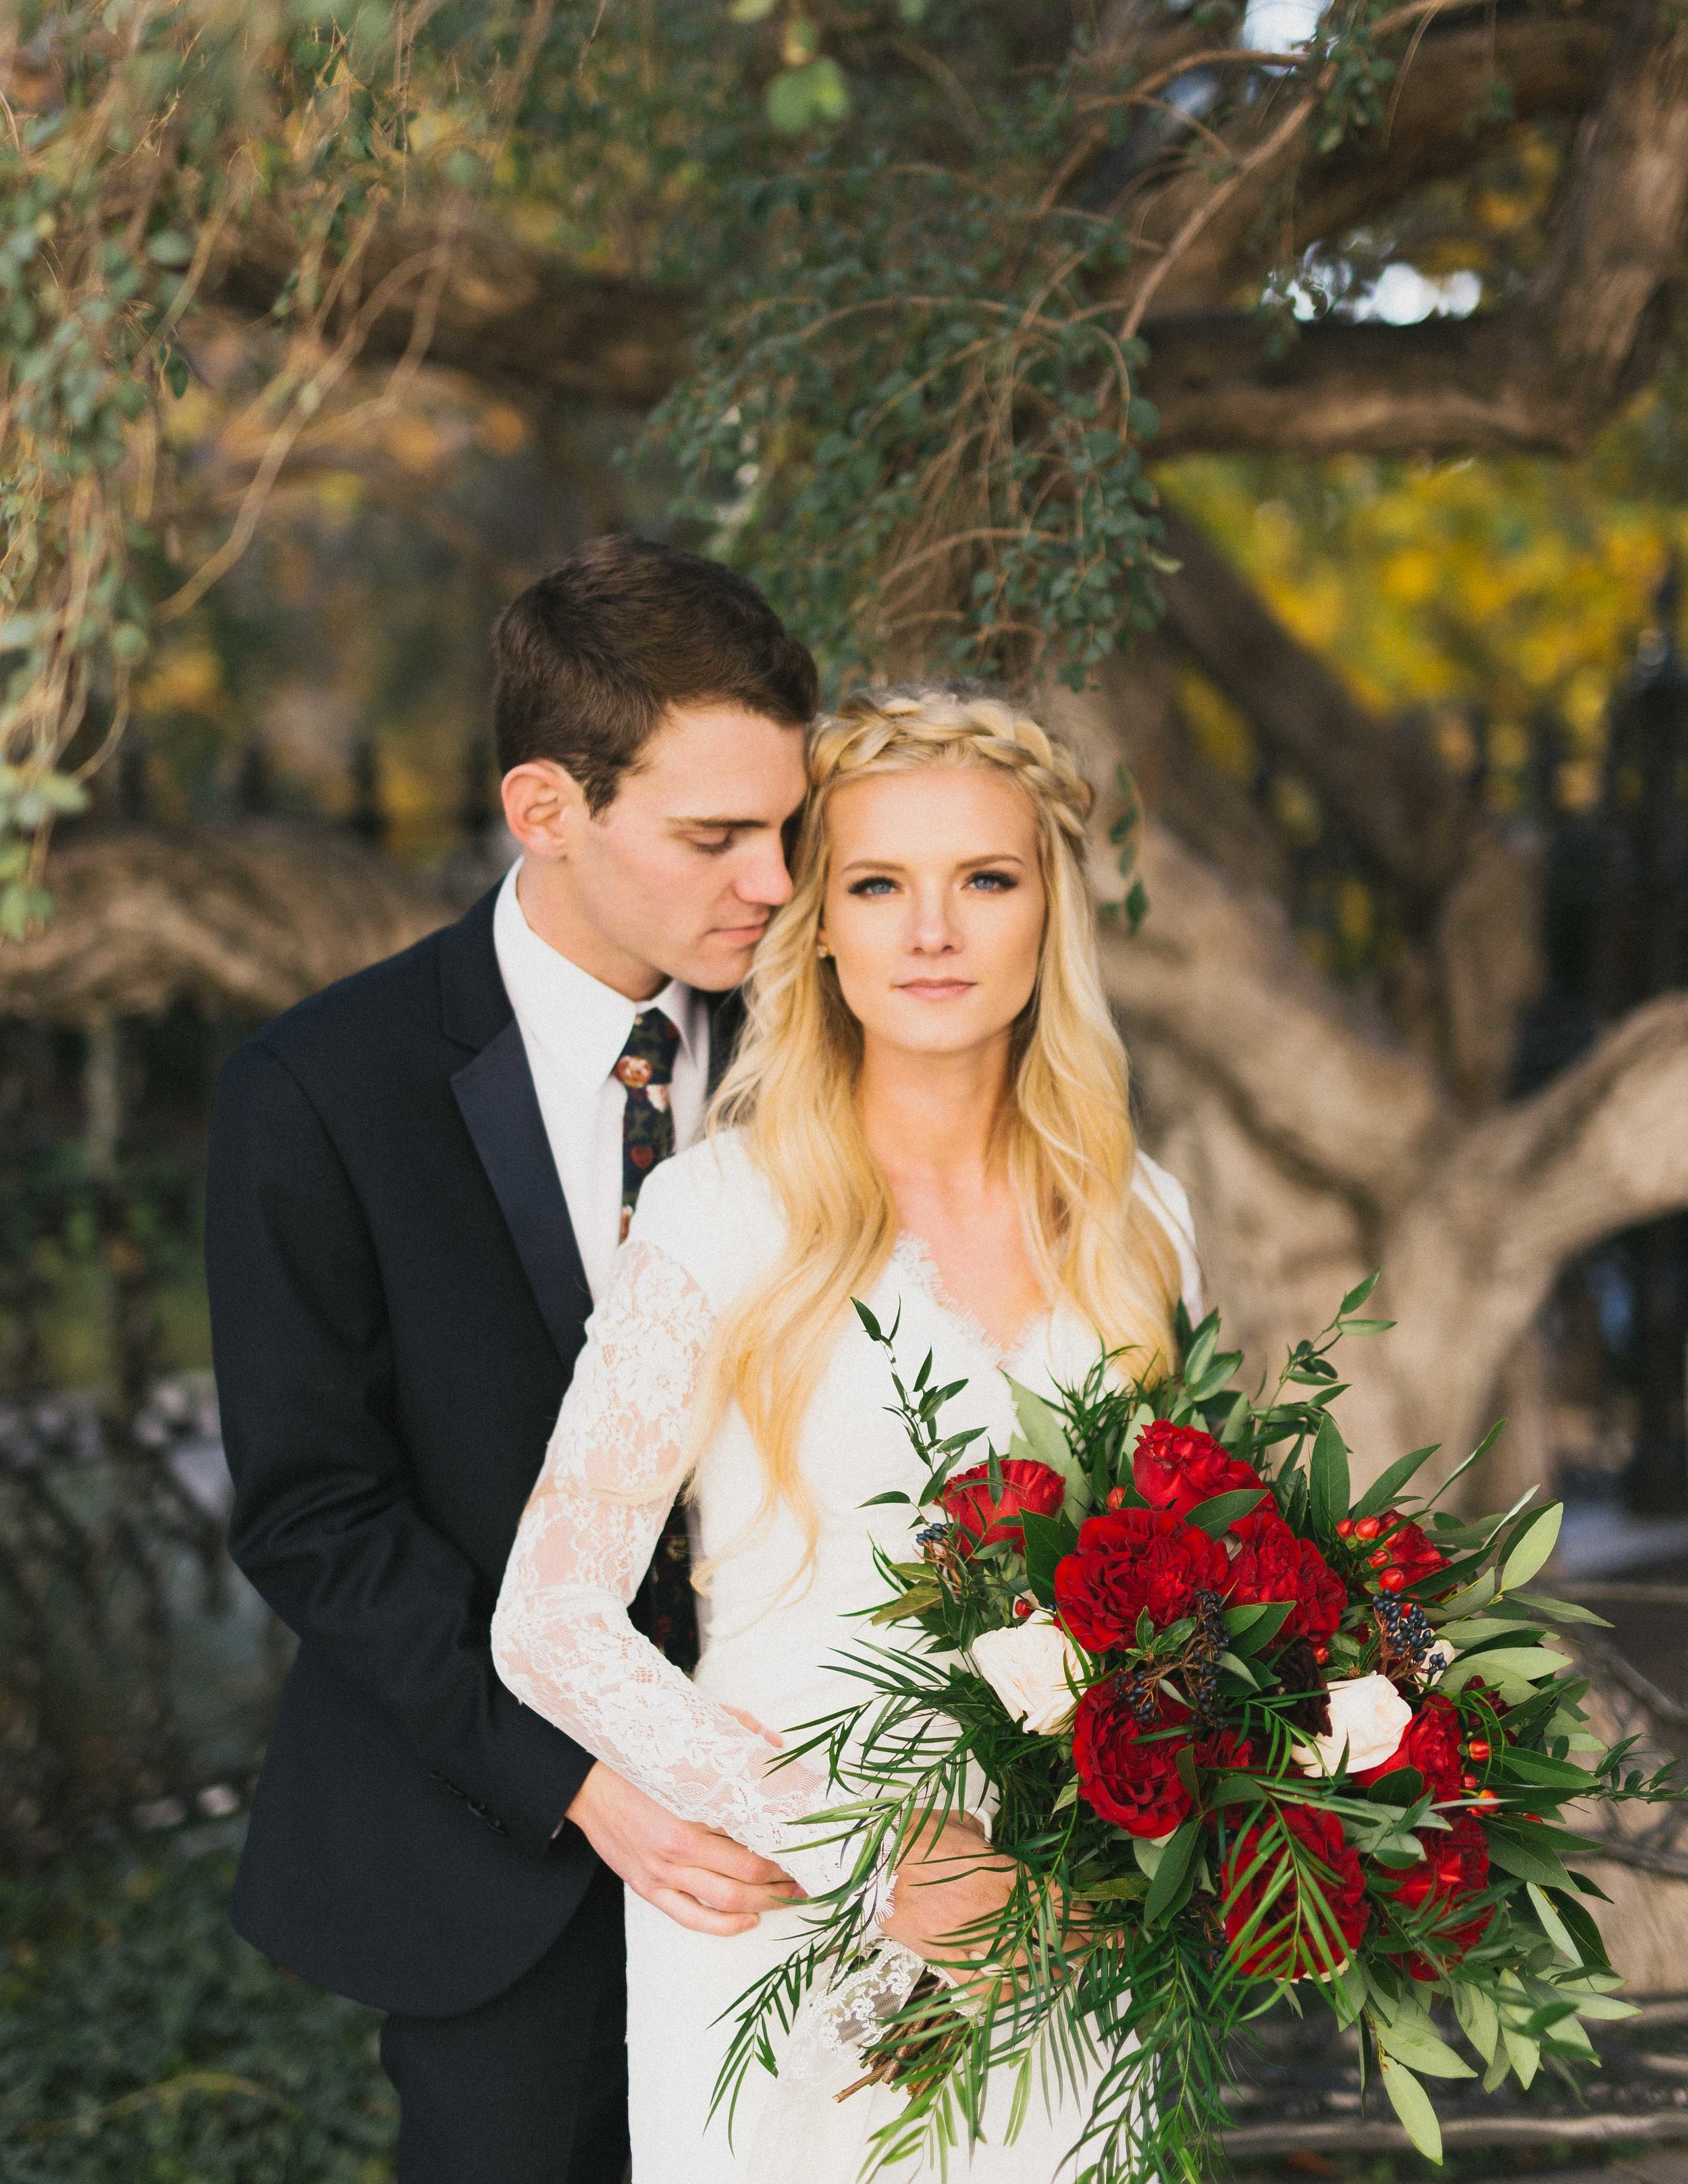 salt-lake-city-wedding-photographer-27.jpg